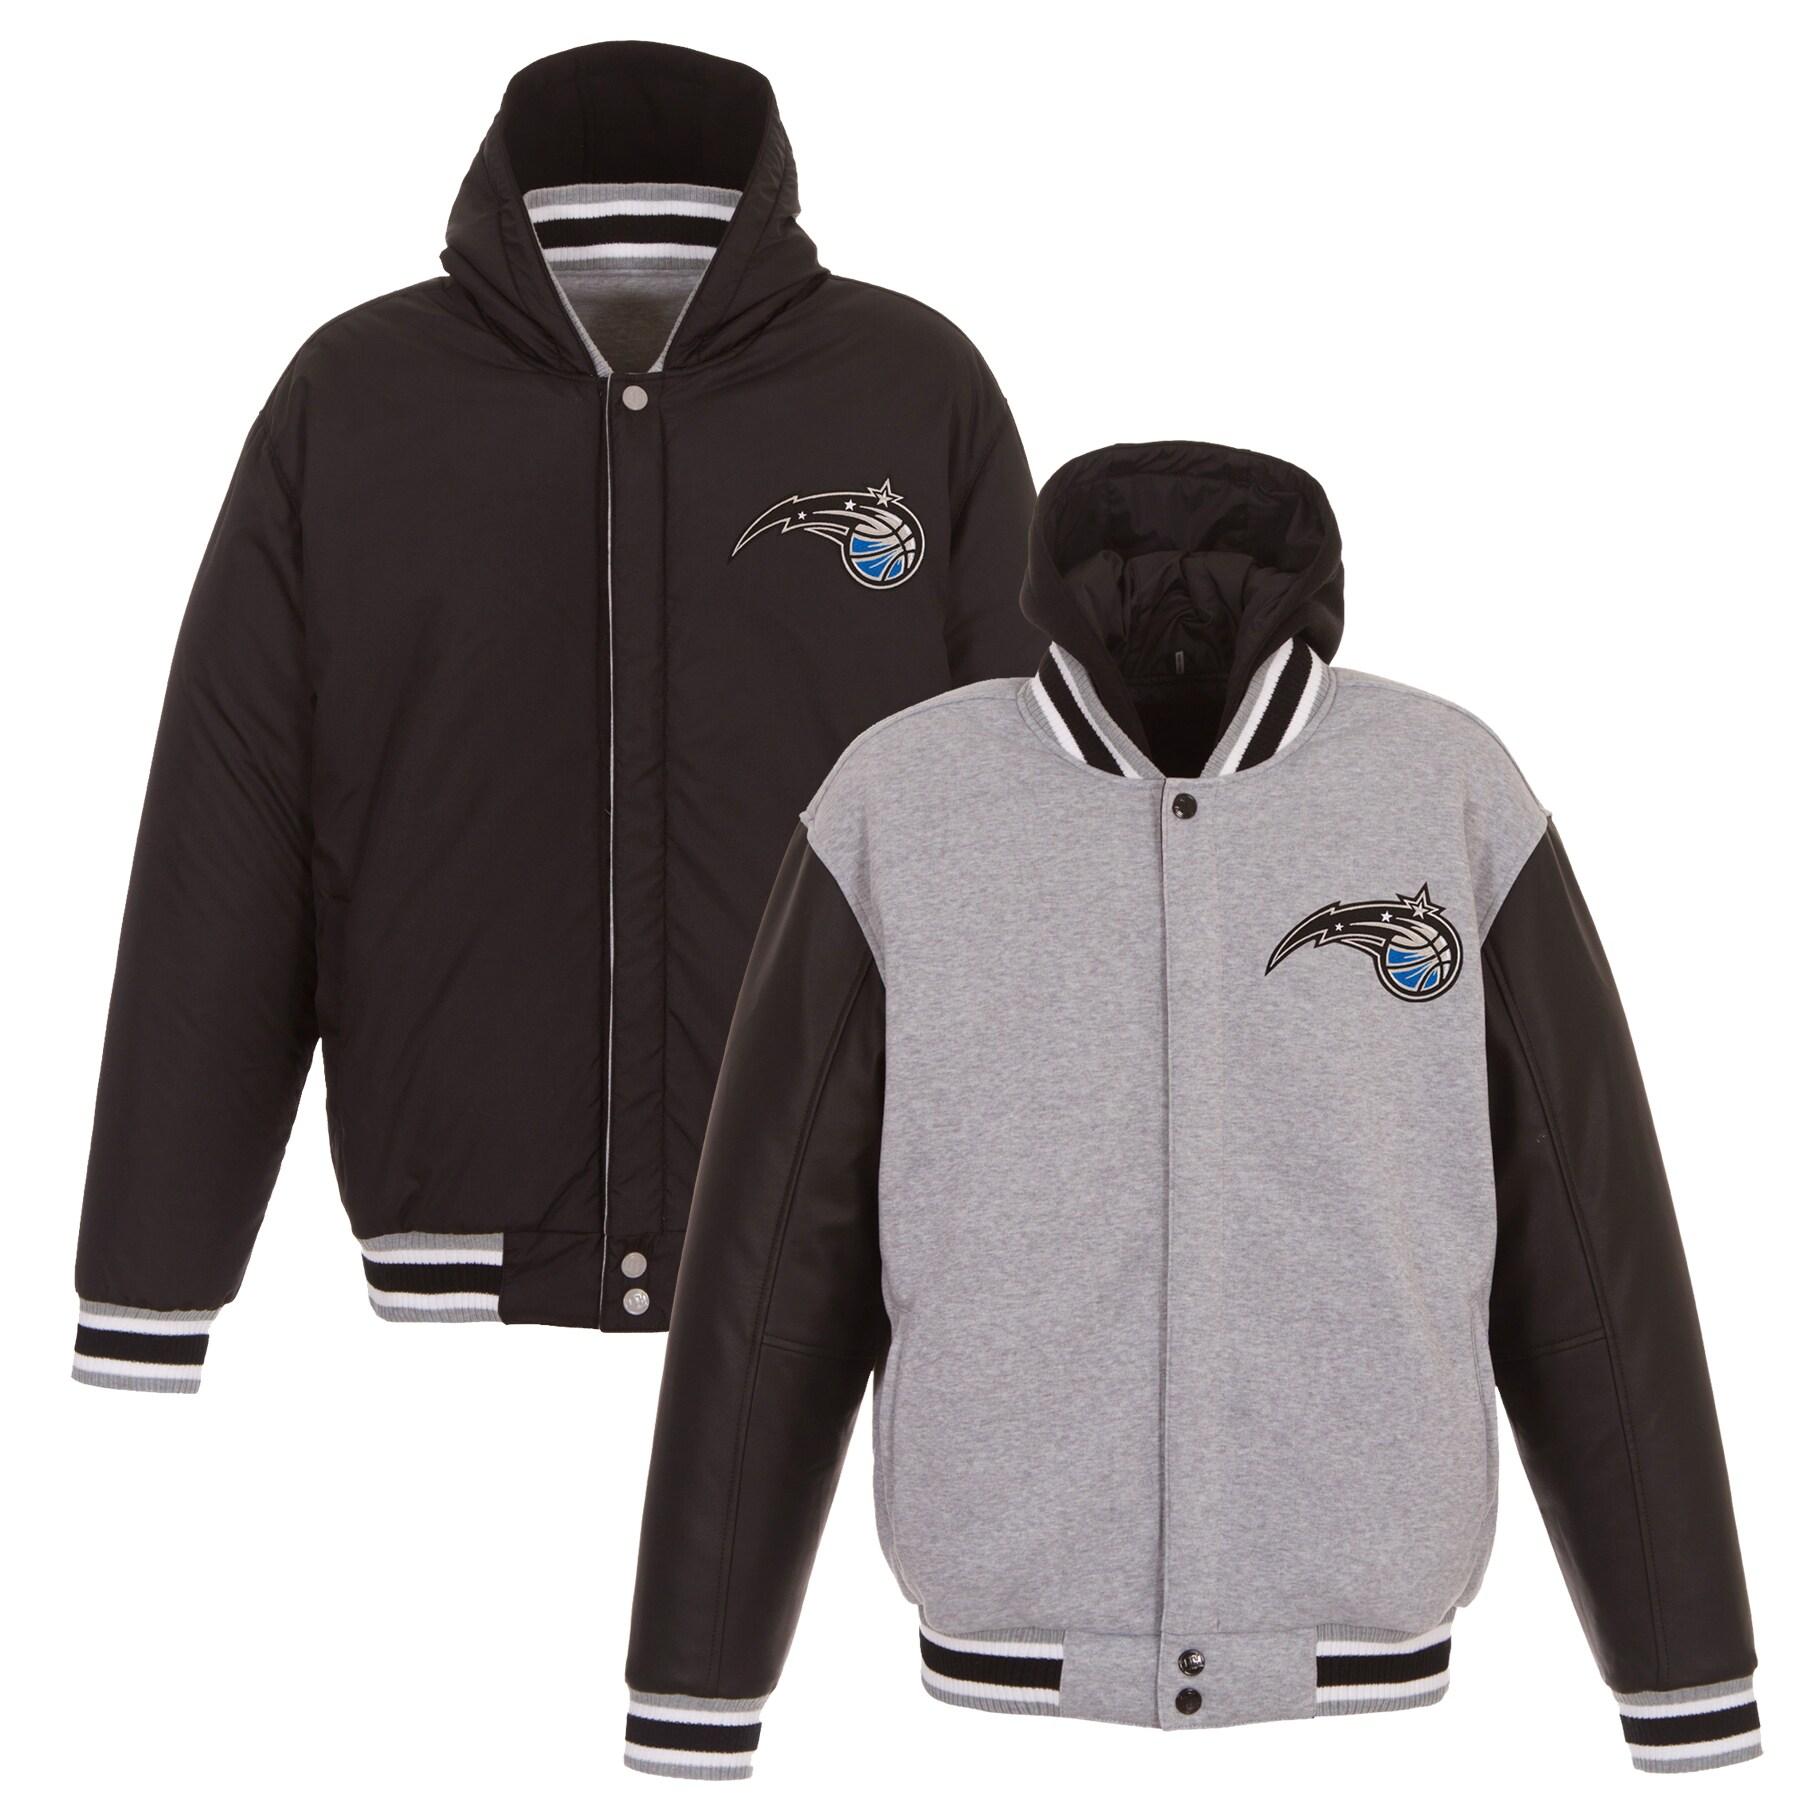 Orlando Magic JH Design Embroidered Logo Reversible Hooded Fleece Full-Snap Jacket - Gray/Black